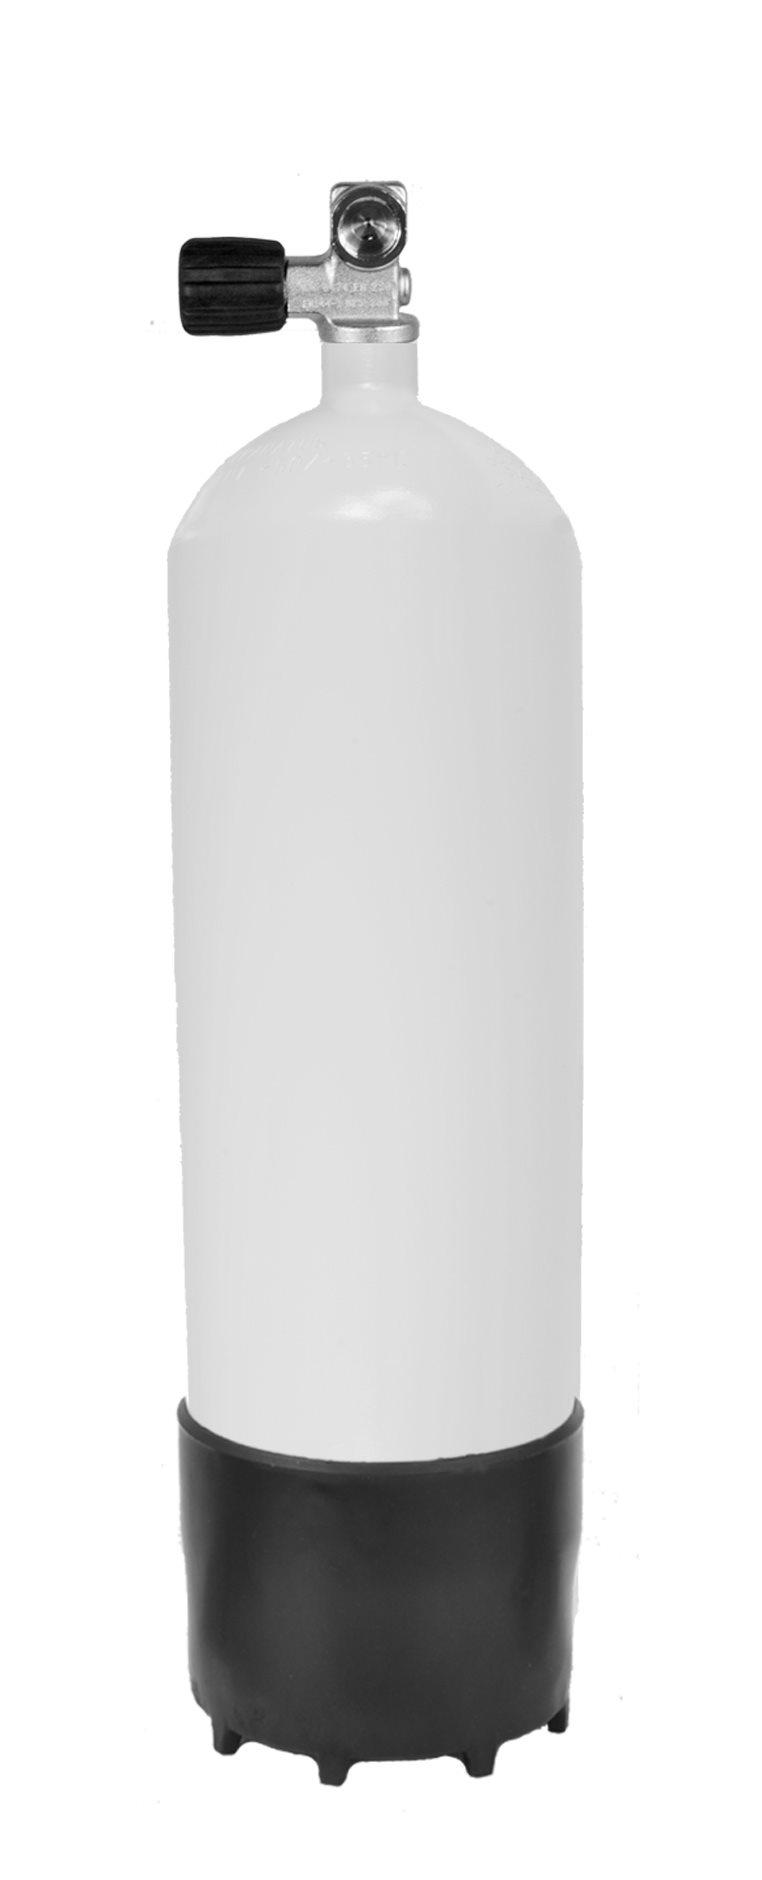 Водолазна бутилка 7 л / 232 бара - Eurocylinder